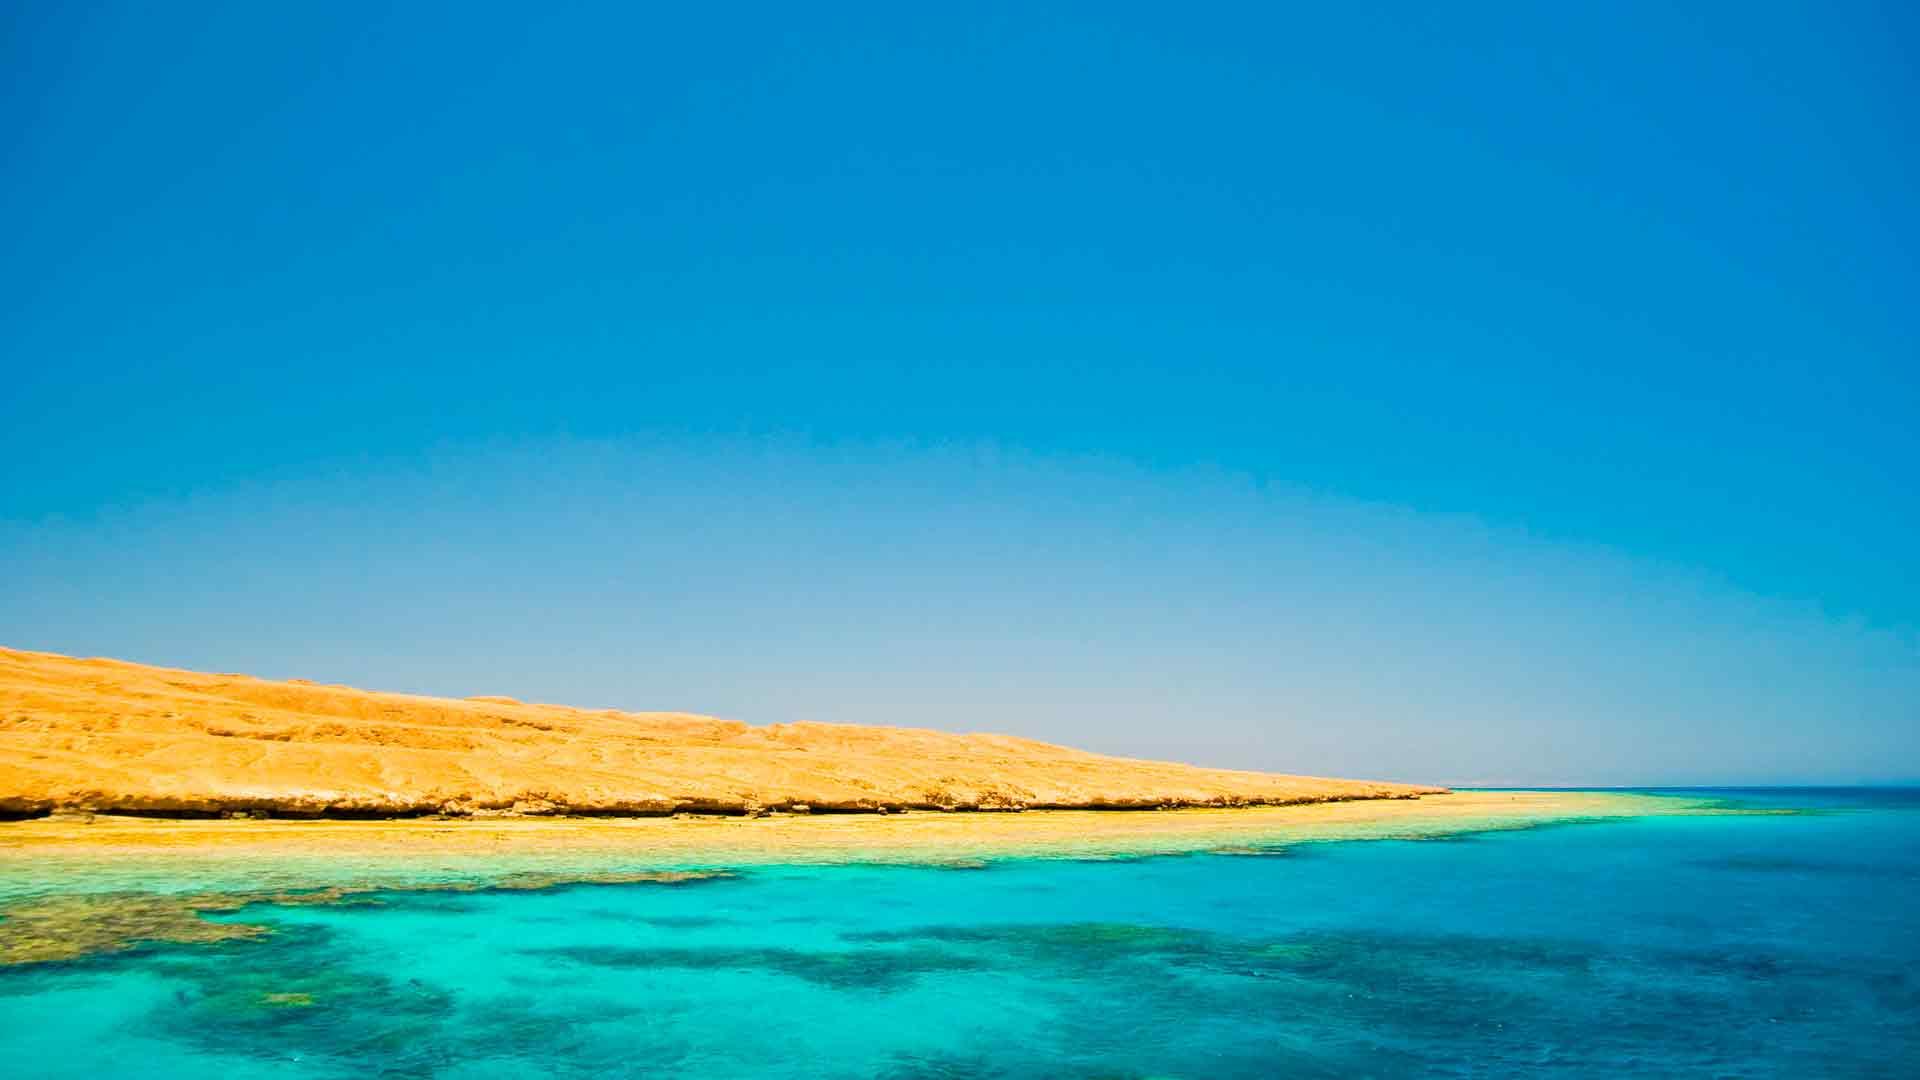 Море голубое море и золотой берег